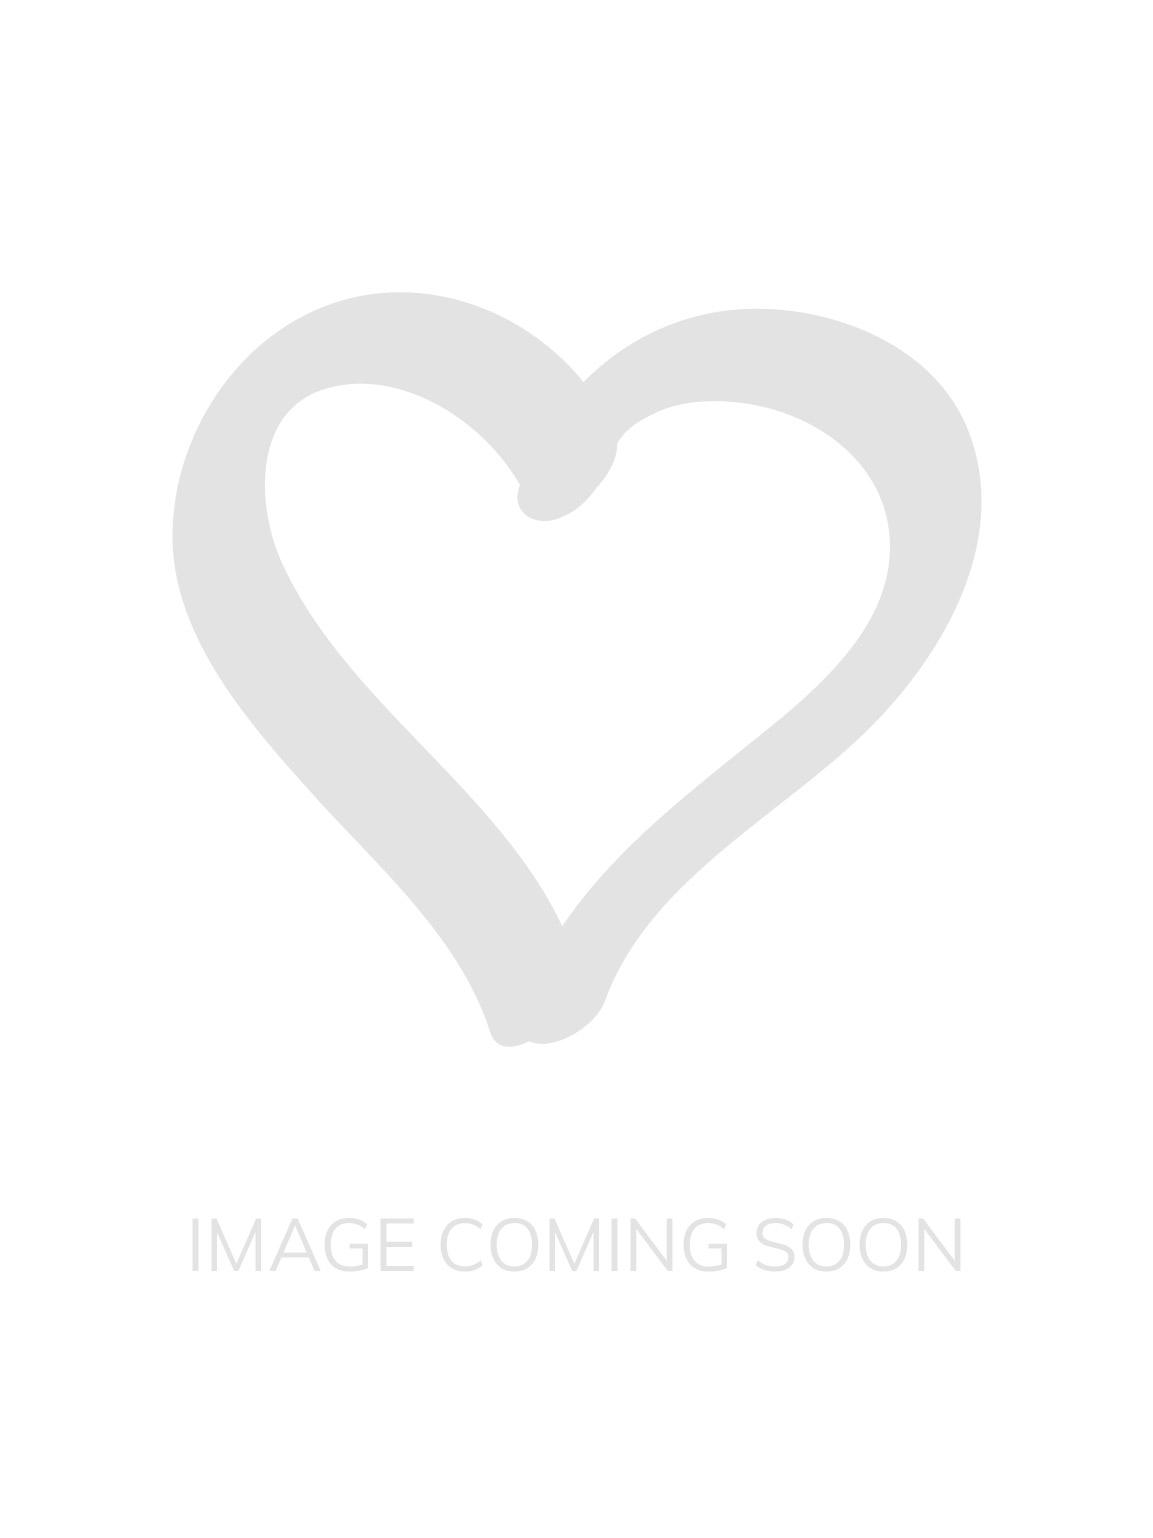 88589cab86 True Shape Sensation W01 Minimiser Bra - Pigeon Grey